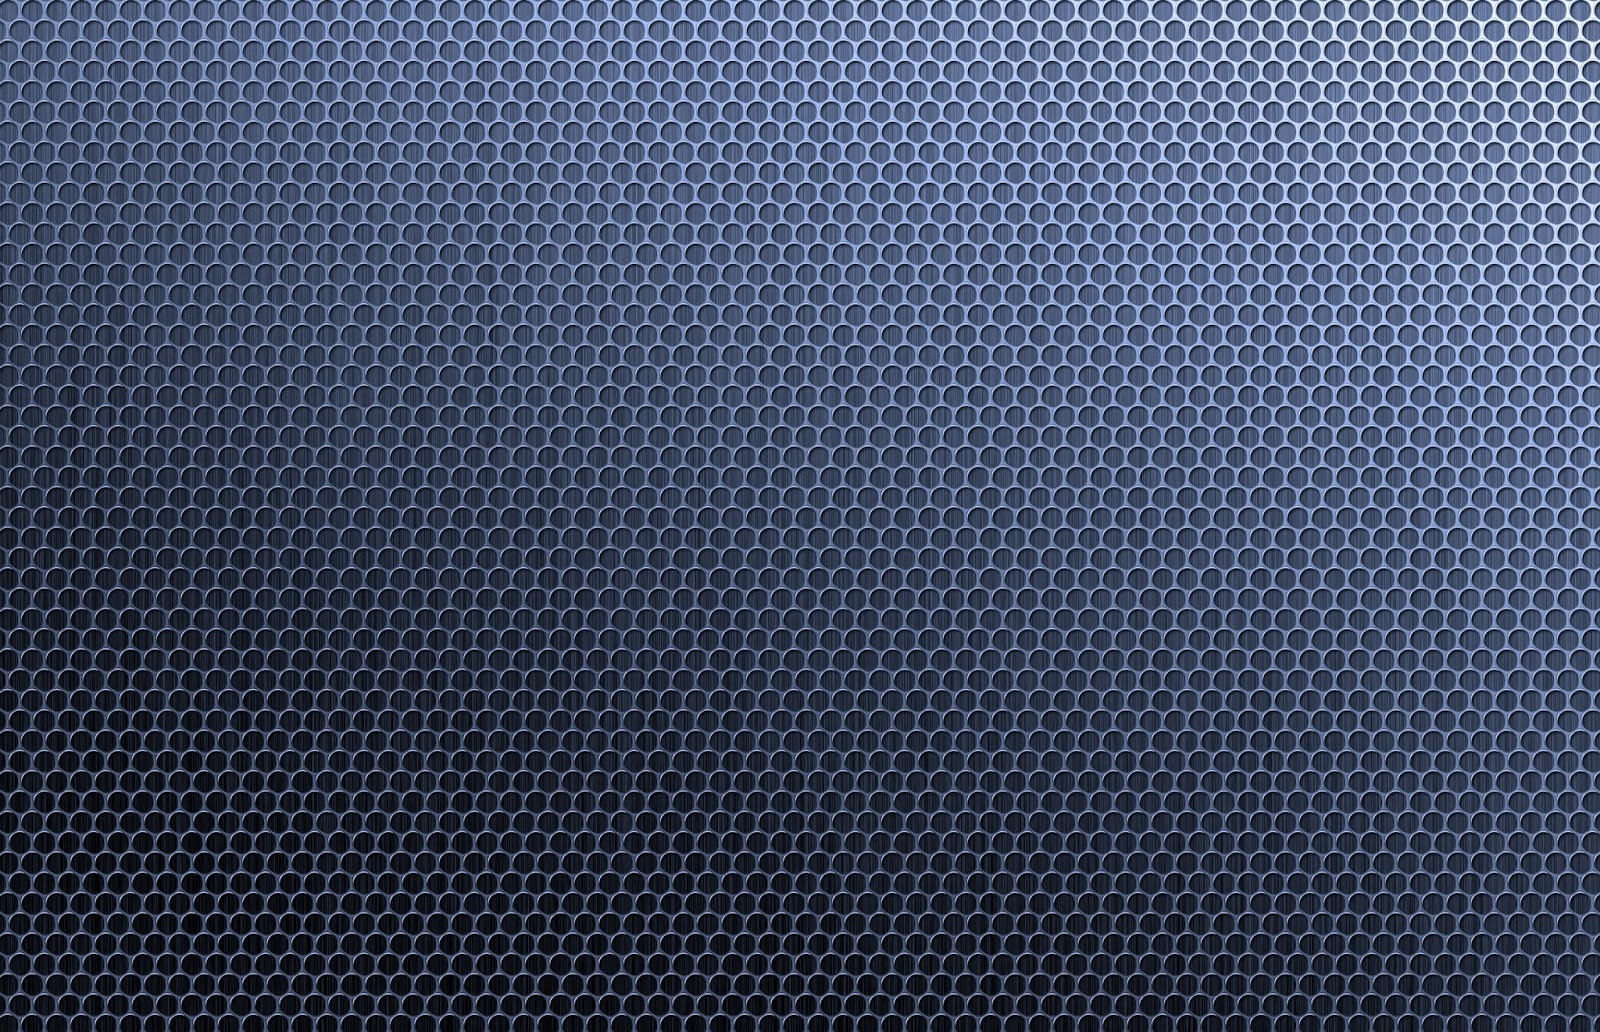 hd wallpapers desktop simple plain hd desktop wallpapers